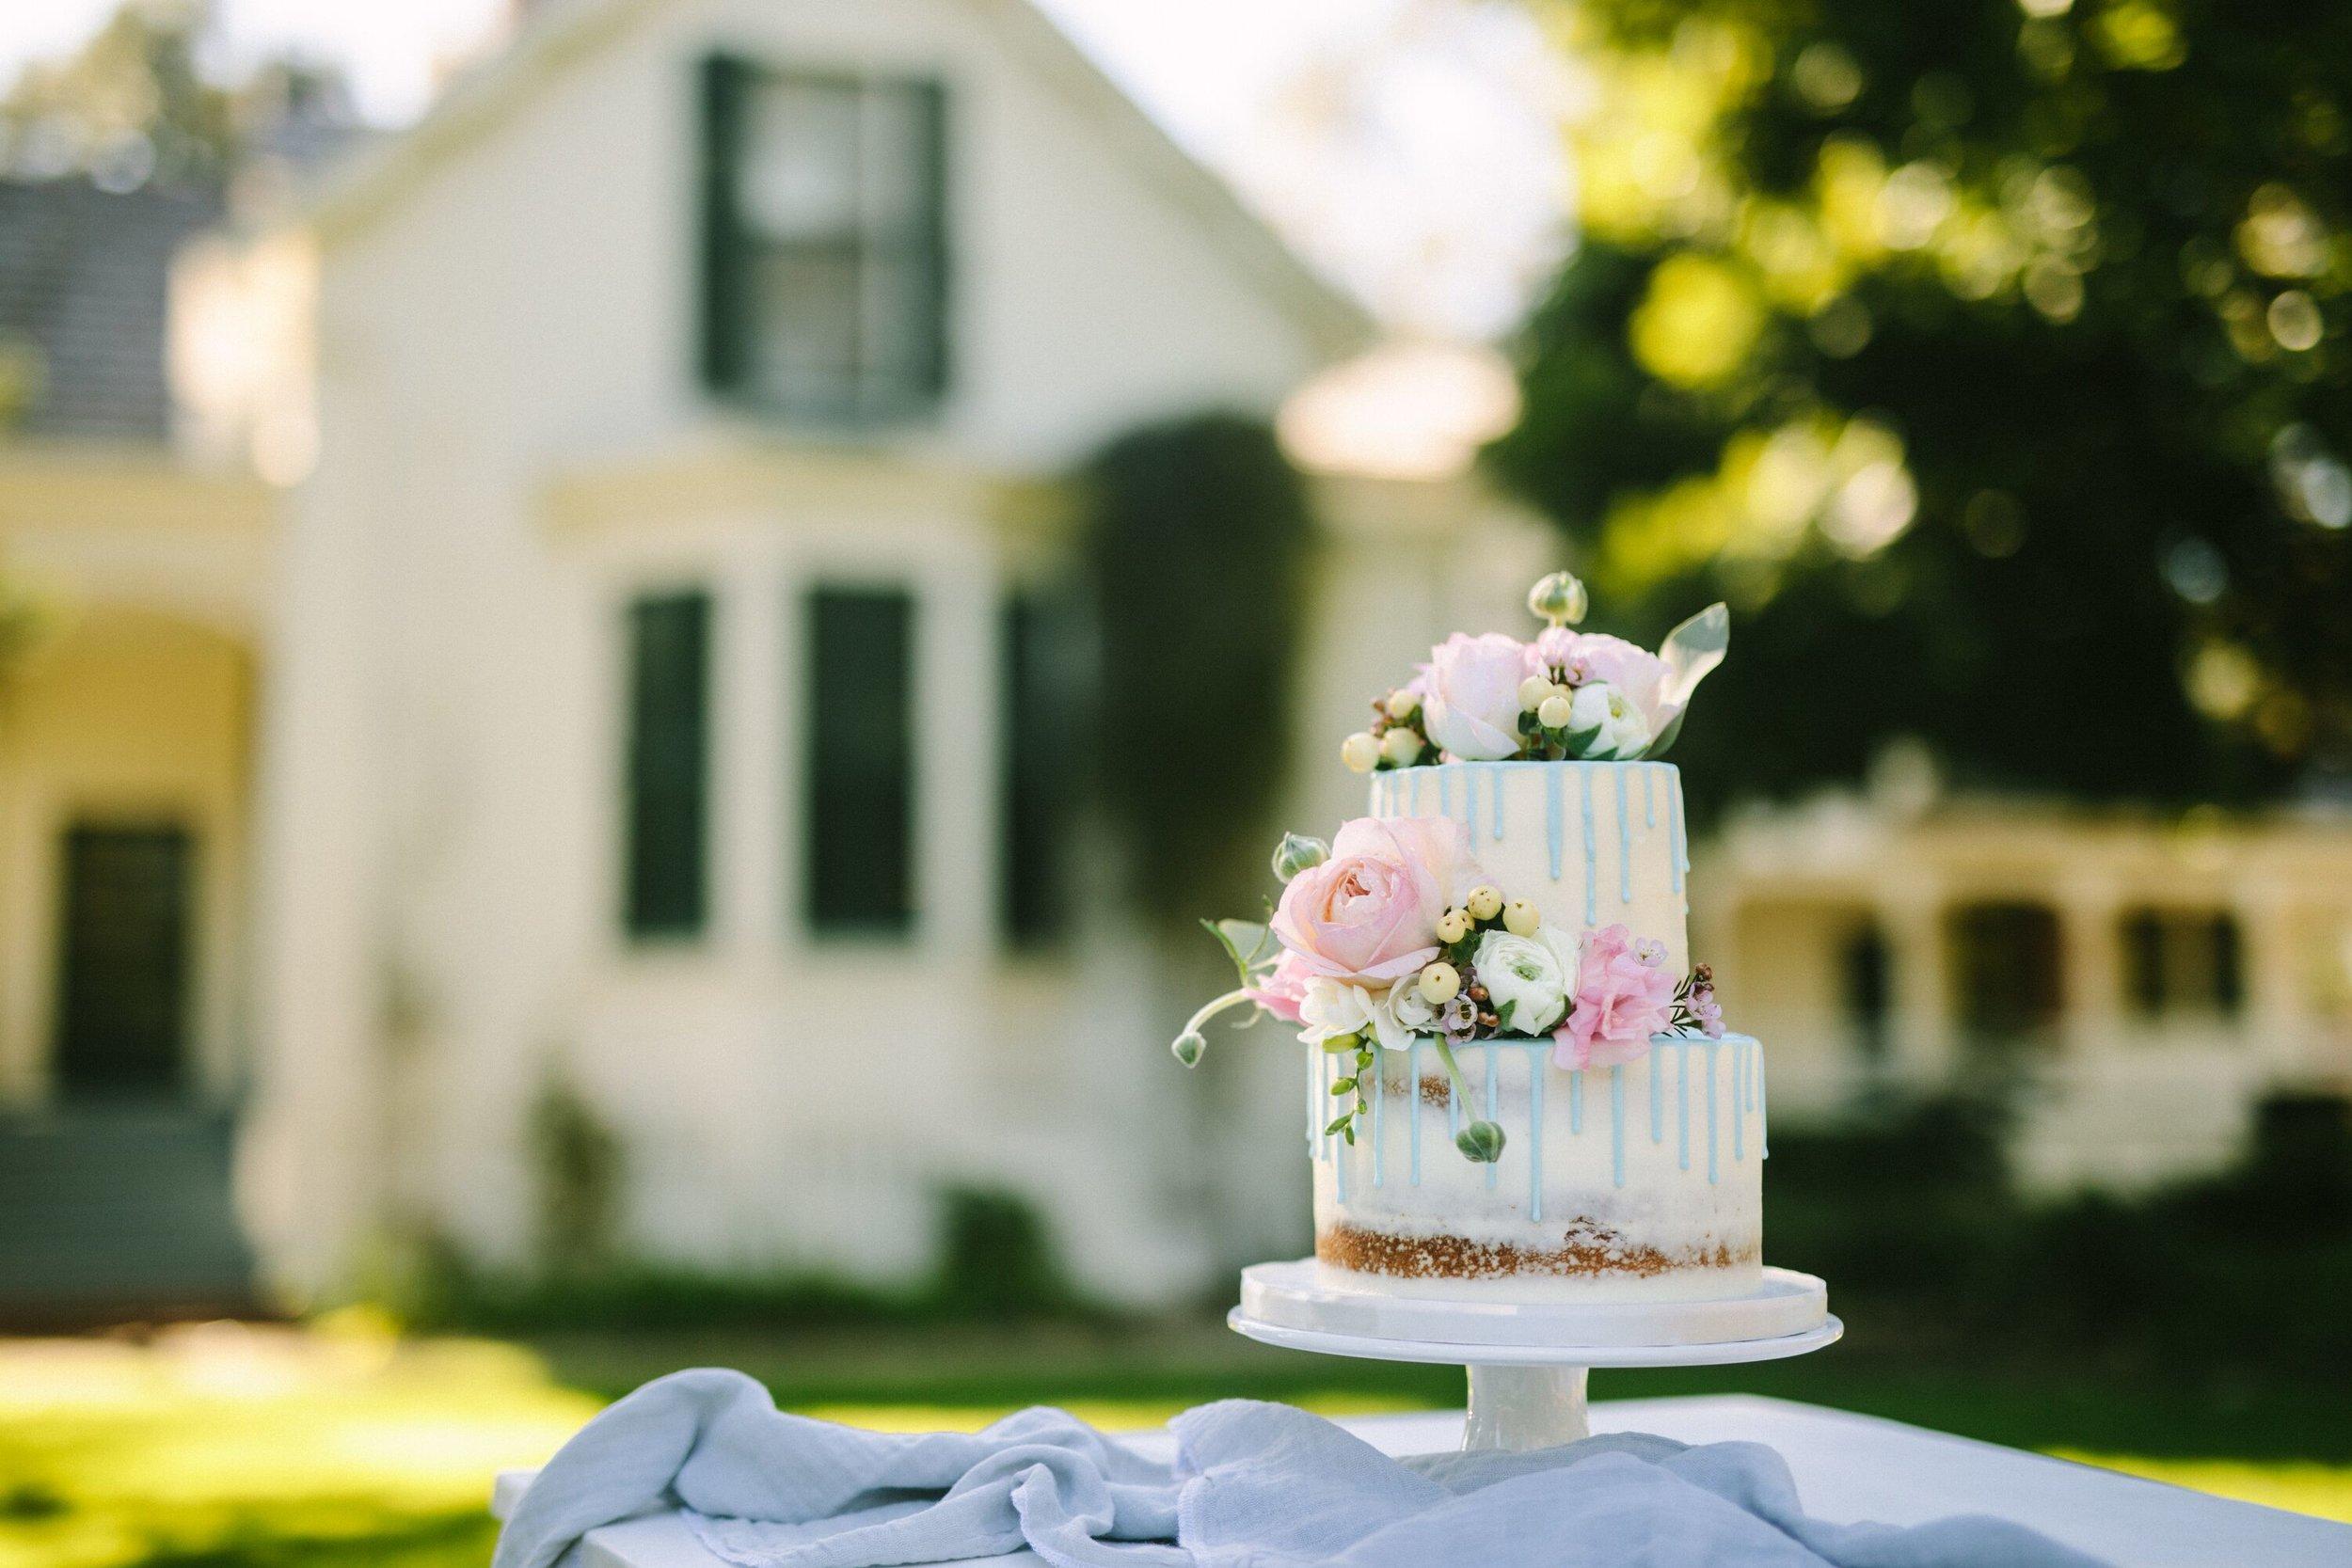 www.santabarbarawedding.com | Photographer: Patrick Ang | Venue: Rancho La Patera & Stow House | Wedding Planner: Elyse Rowen of Elyse Events | Wedding Cake